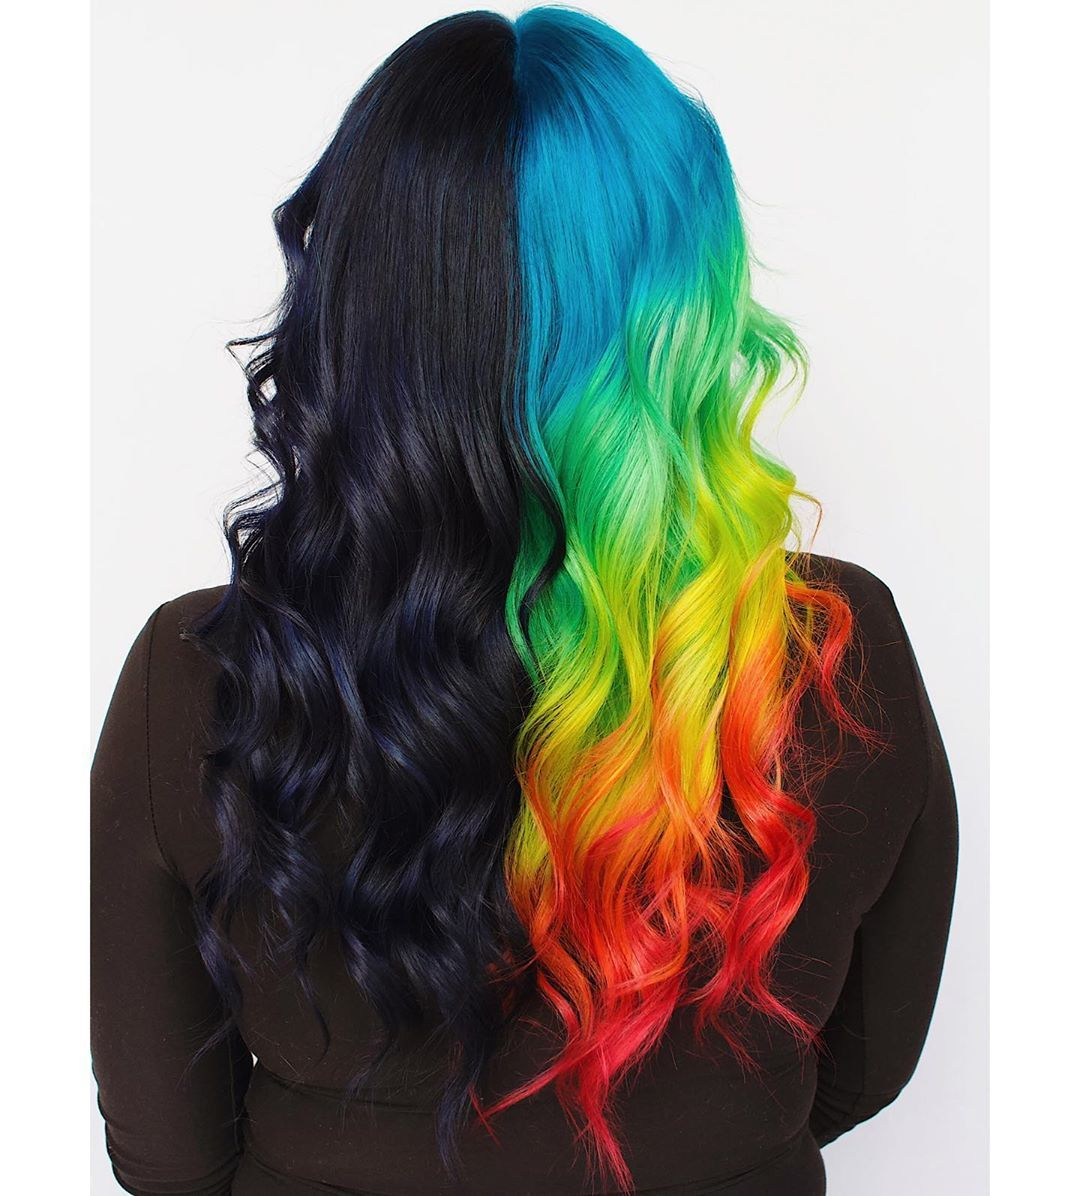 Denver Hair Colorist Isabelle On Instagram Unholy Pulpriothair Pulpriot Fallintotheriot H Split Dyed Hair Aesthetic Hair Rainbow Hair Color